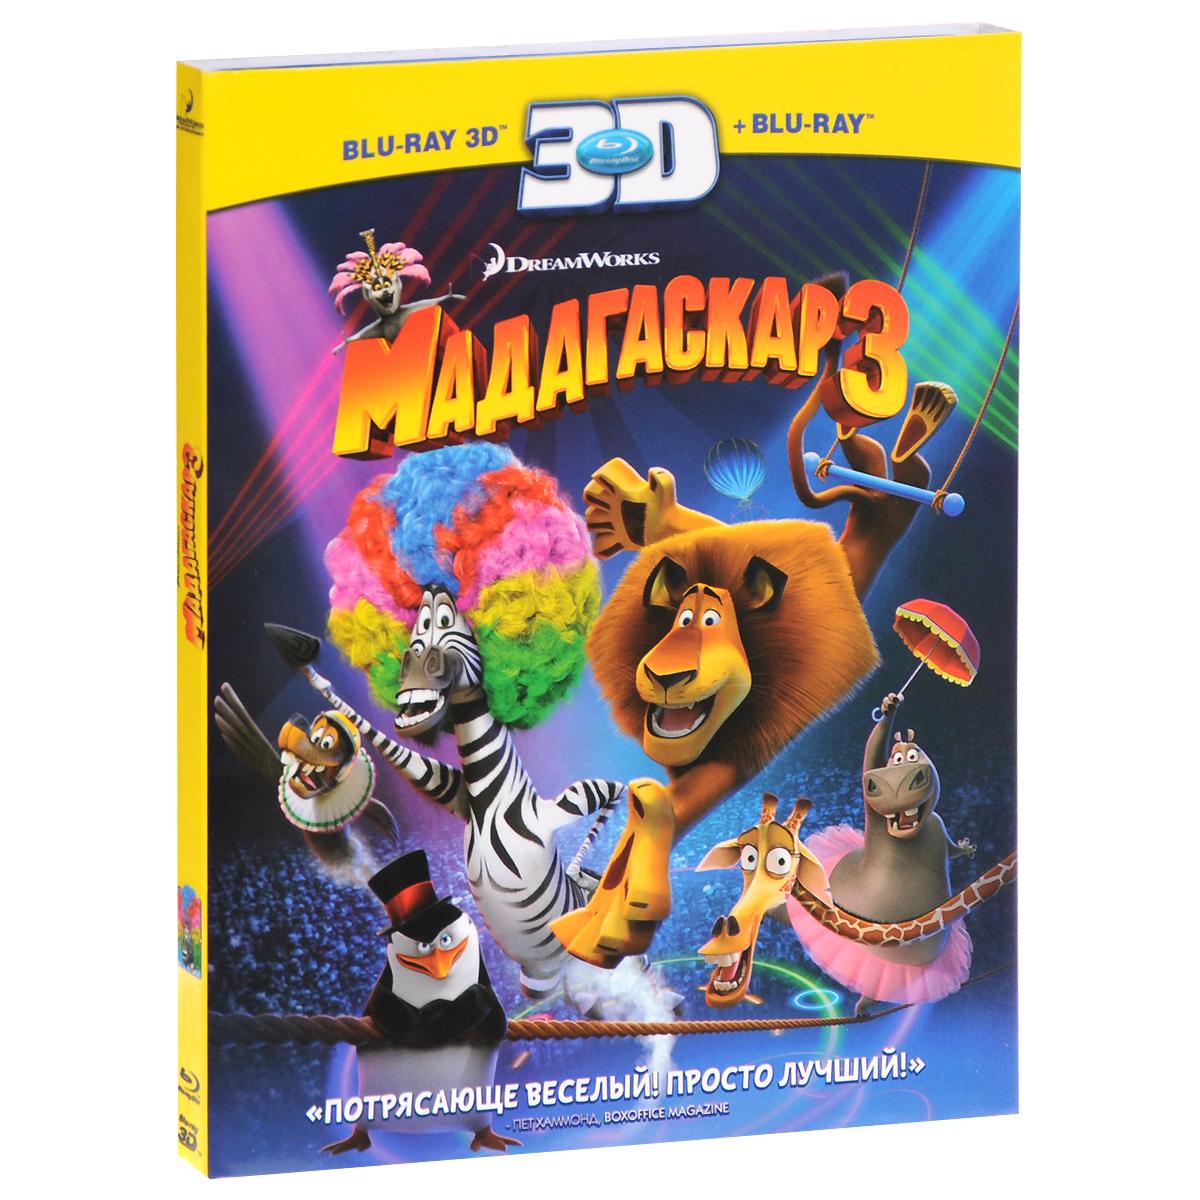 Мадагаскар 3 3D и 2D (2 Blu-ray)